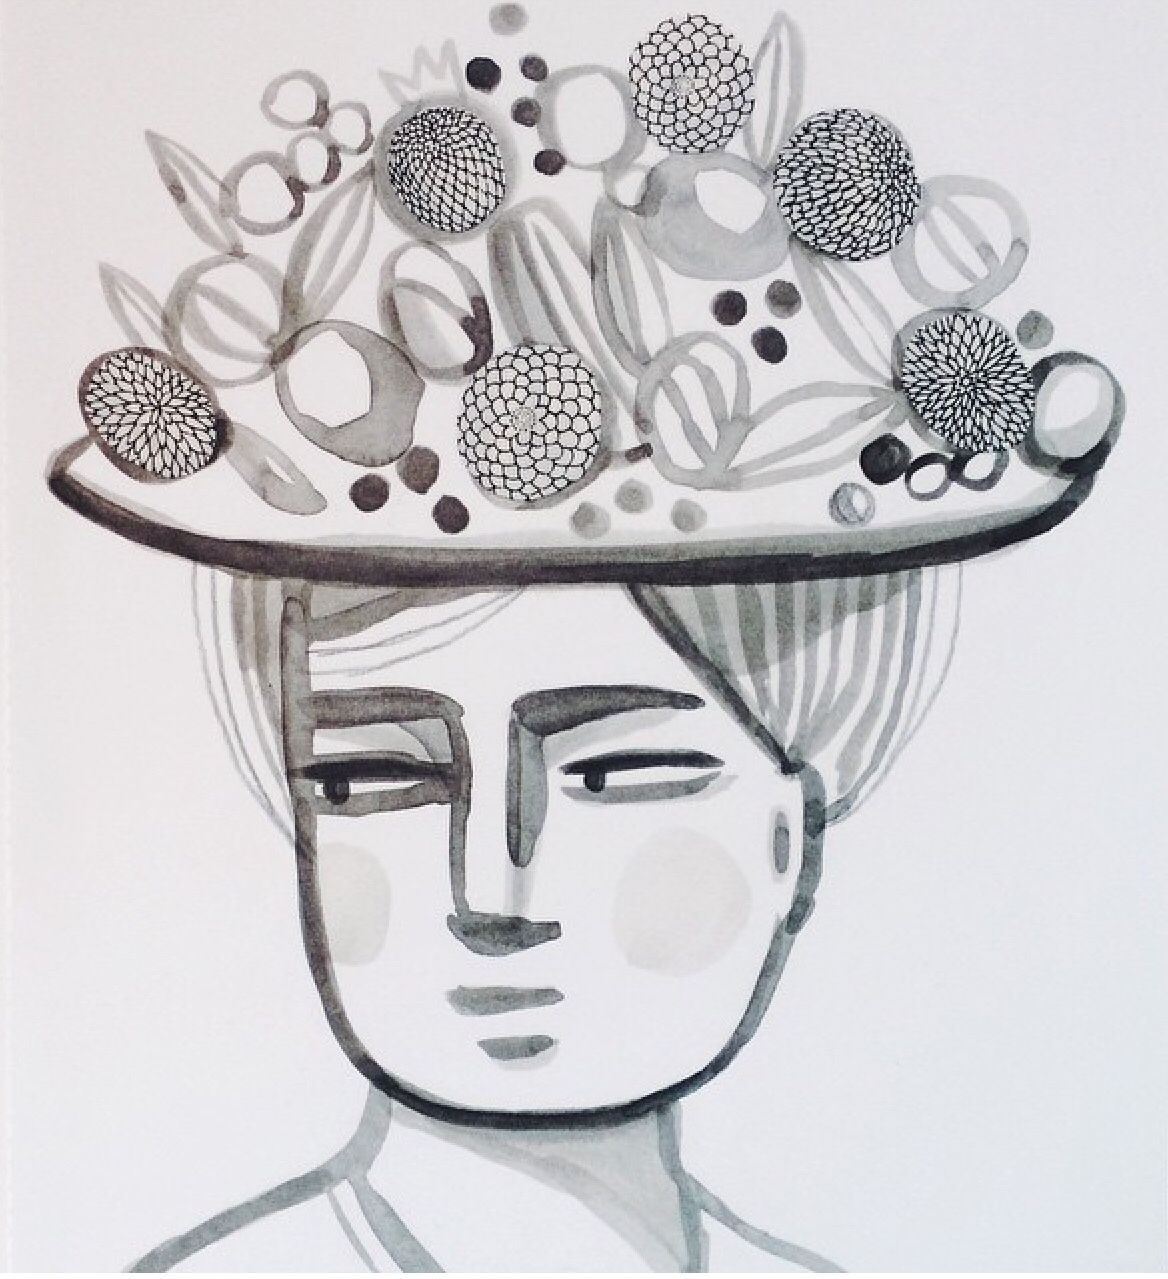 Daysinbloom - Larissa Bertonasco - La cucina verde | Artes | Pinterest